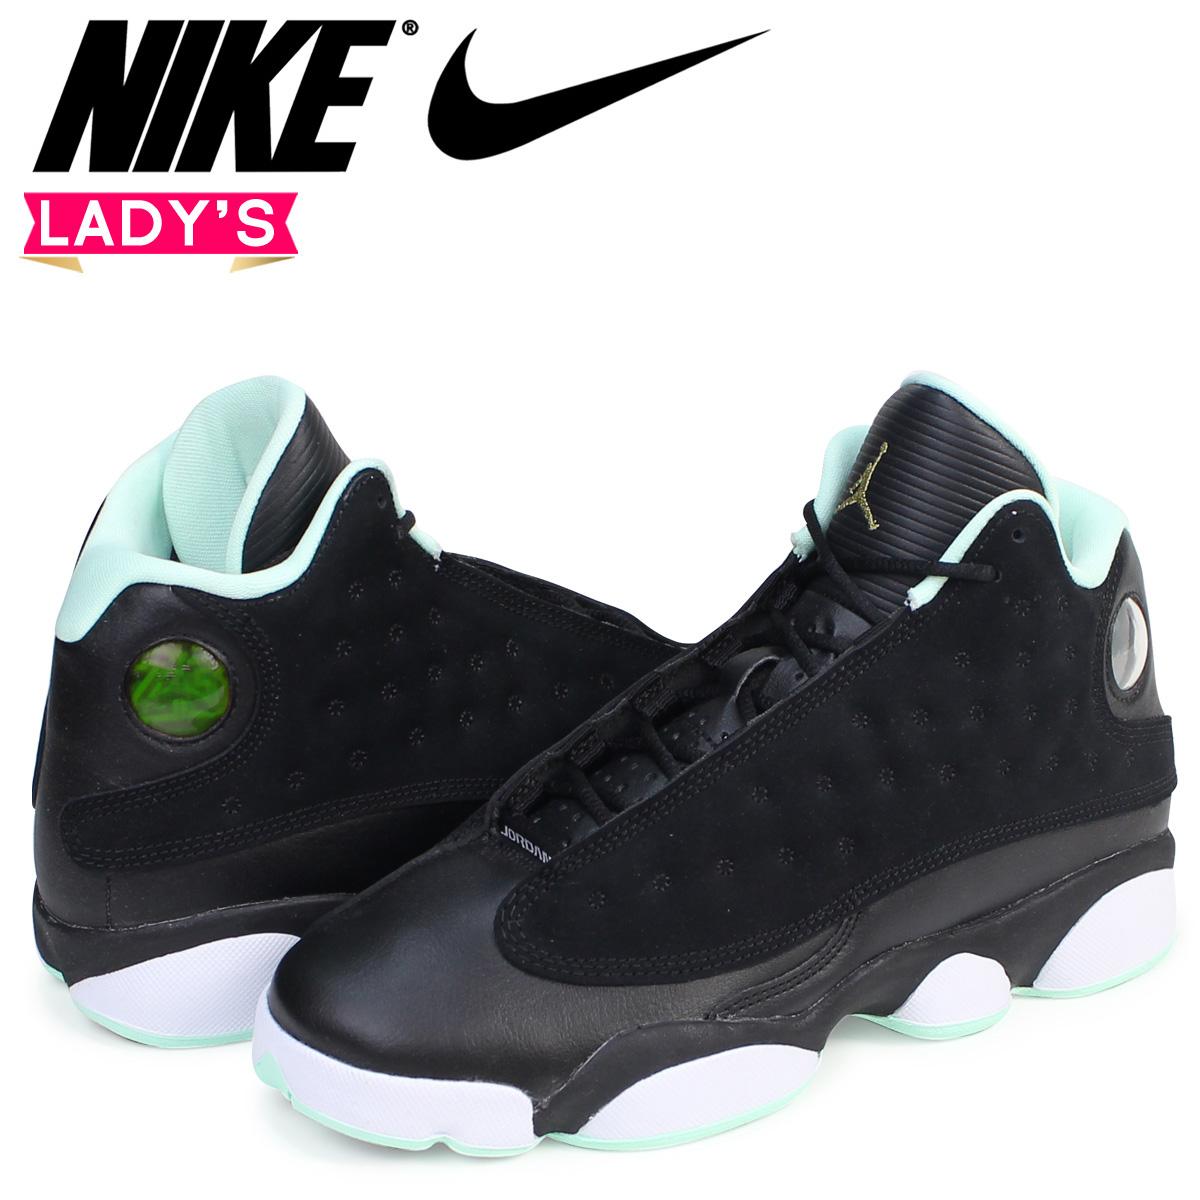 b366681bf42f Nike NIKE Air Jordan 13 nostalgic lady s sneakers AIR JORDAN 13 RETRO  439